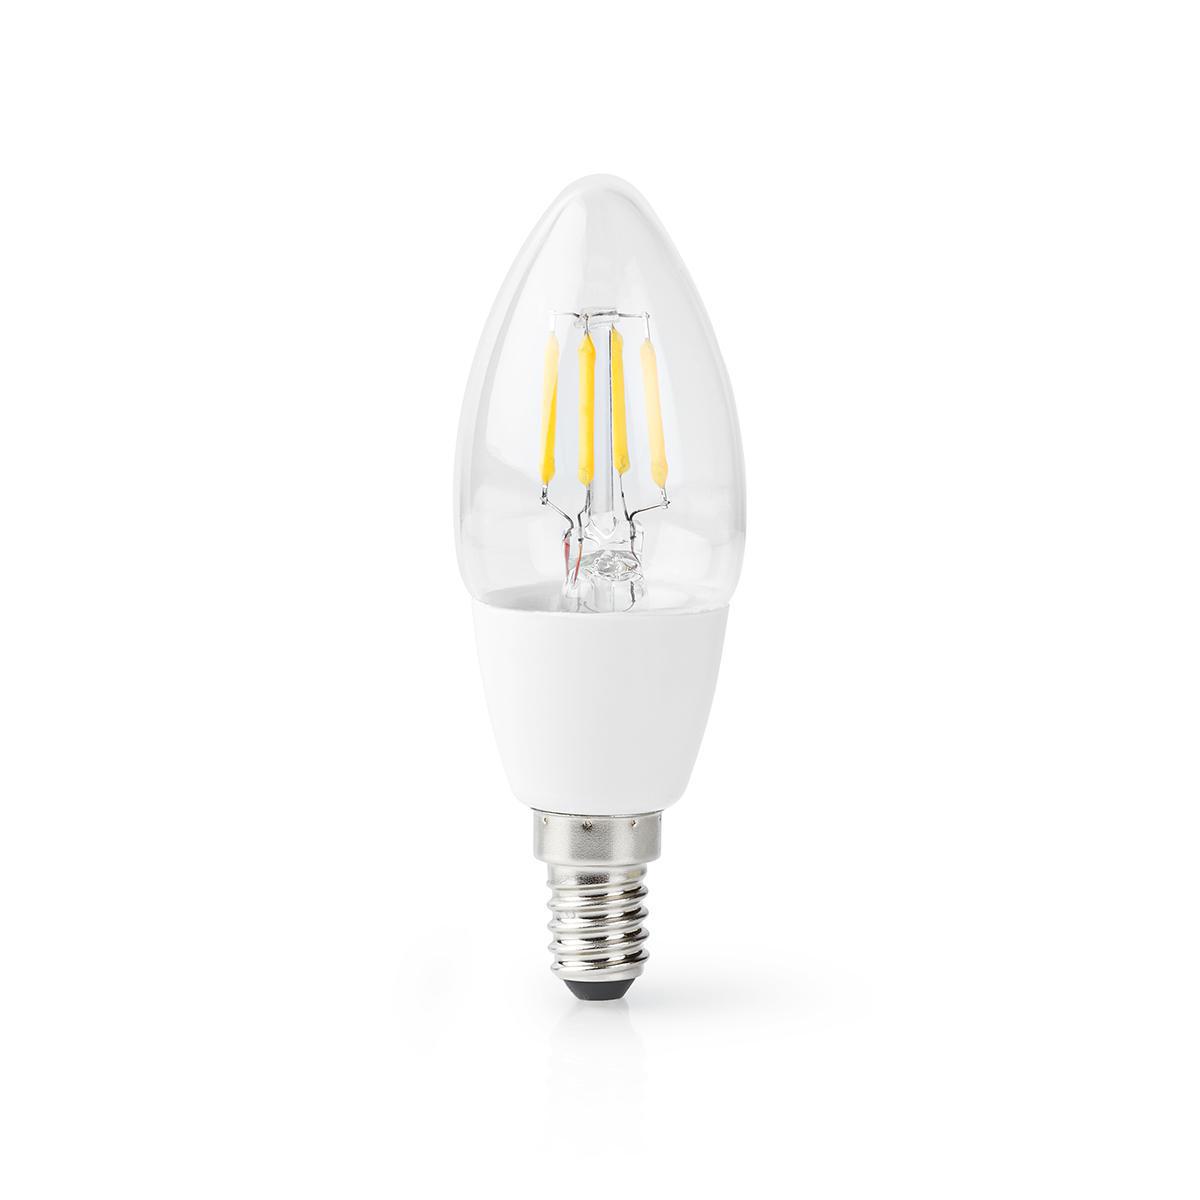 Slimme Led Lamp E14 fitting 2700K - Warm wit - lamp uit